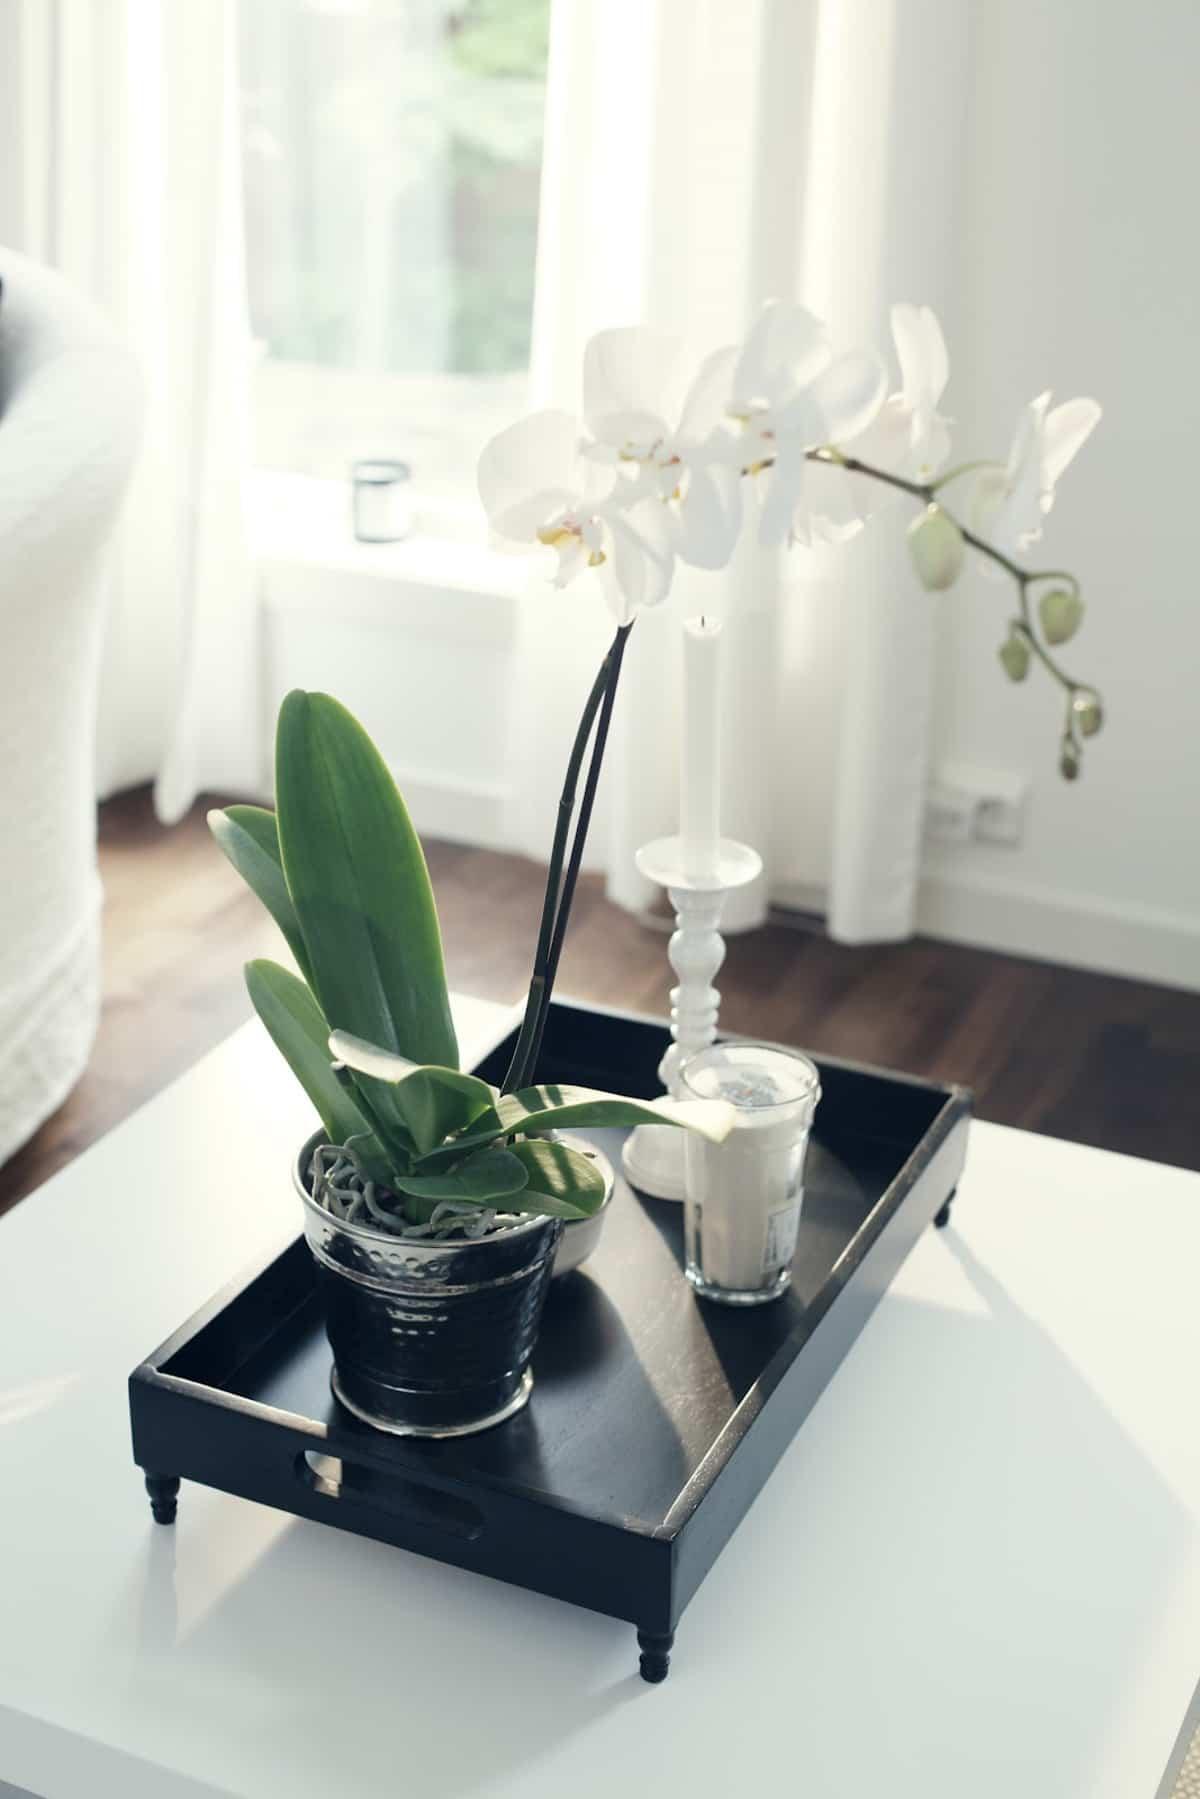 claves para decorar con orquideas tu hogar 11